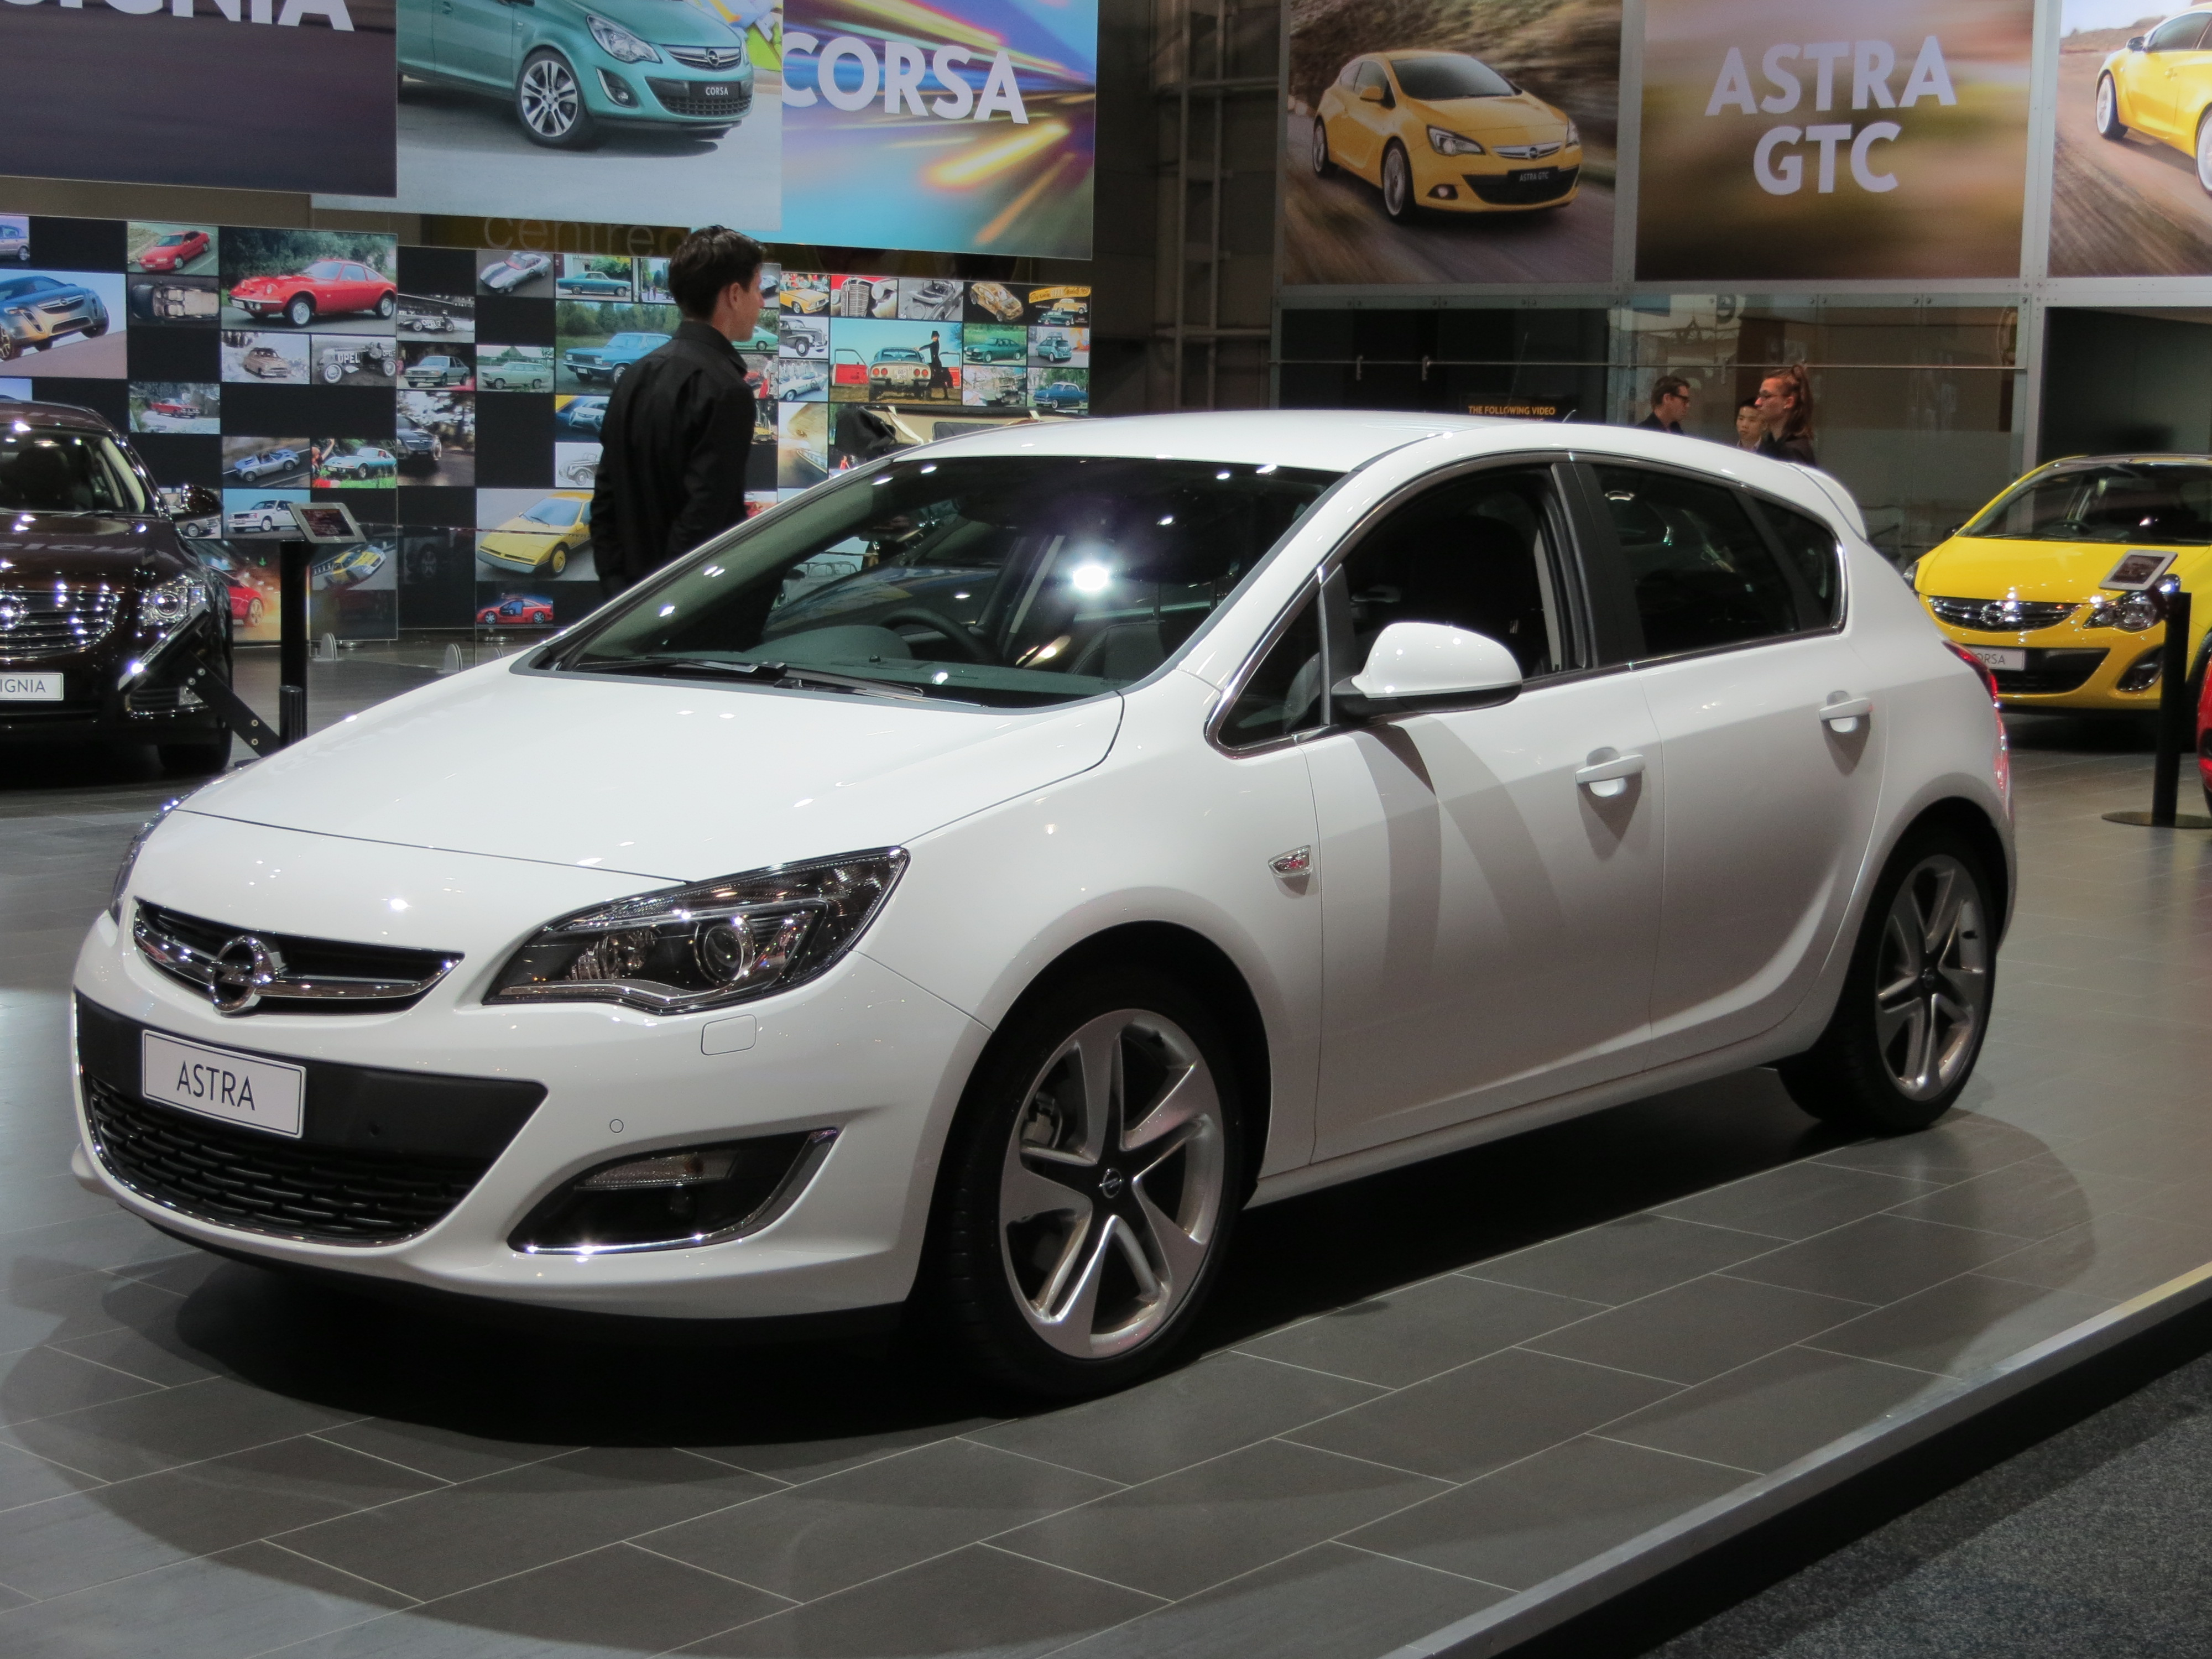 File:2012 Opel Astra (AS) Sport 5-door hatchback (2012- & File:2012 Opel Astra (AS) Sport 5-door hatchback (2012-10-26) 01 ... Pezcame.Com